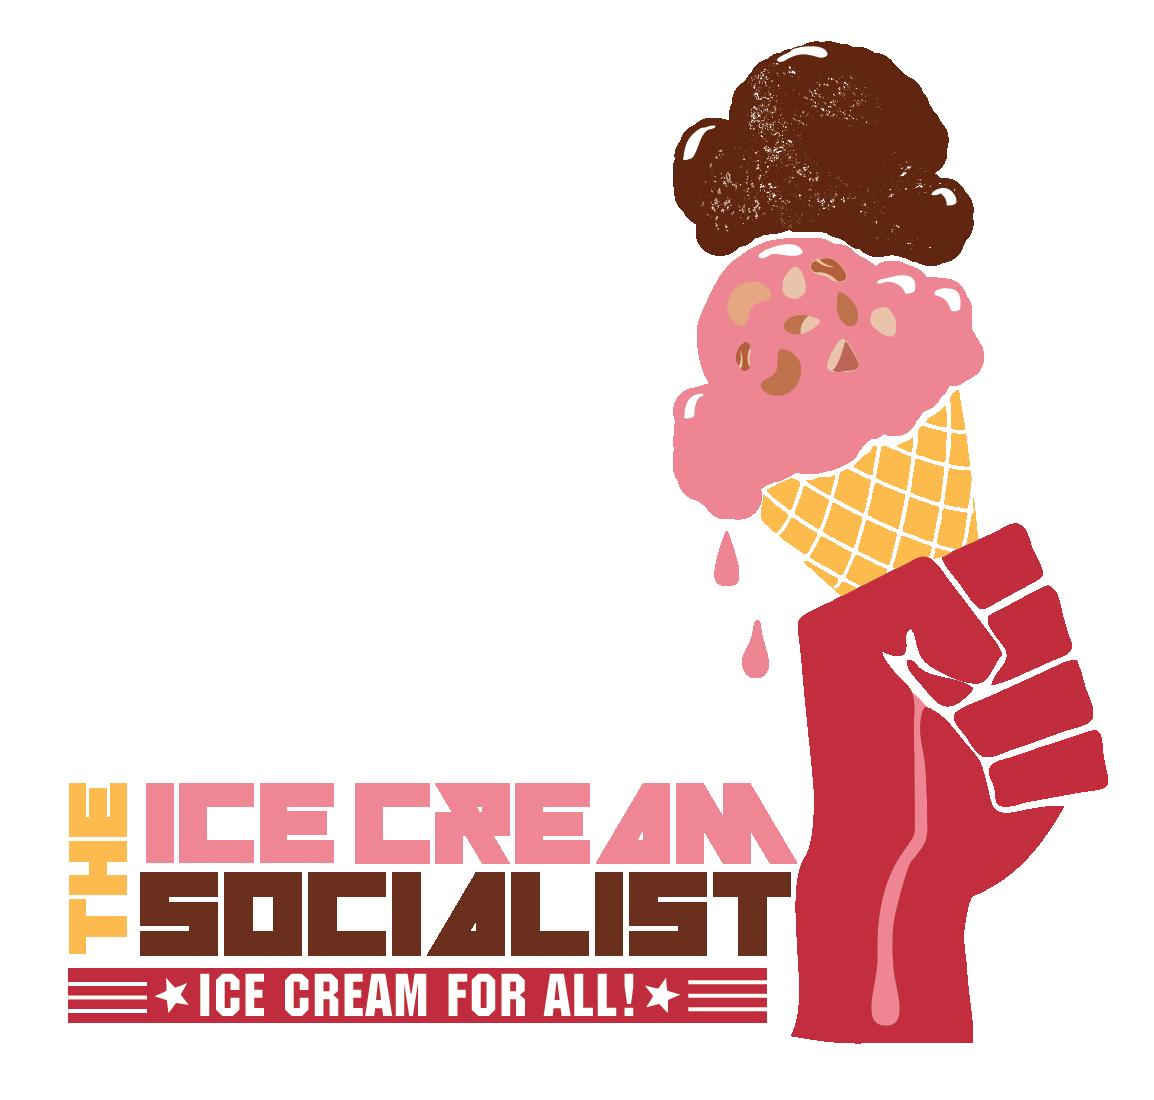 The Ice Cream Socialist